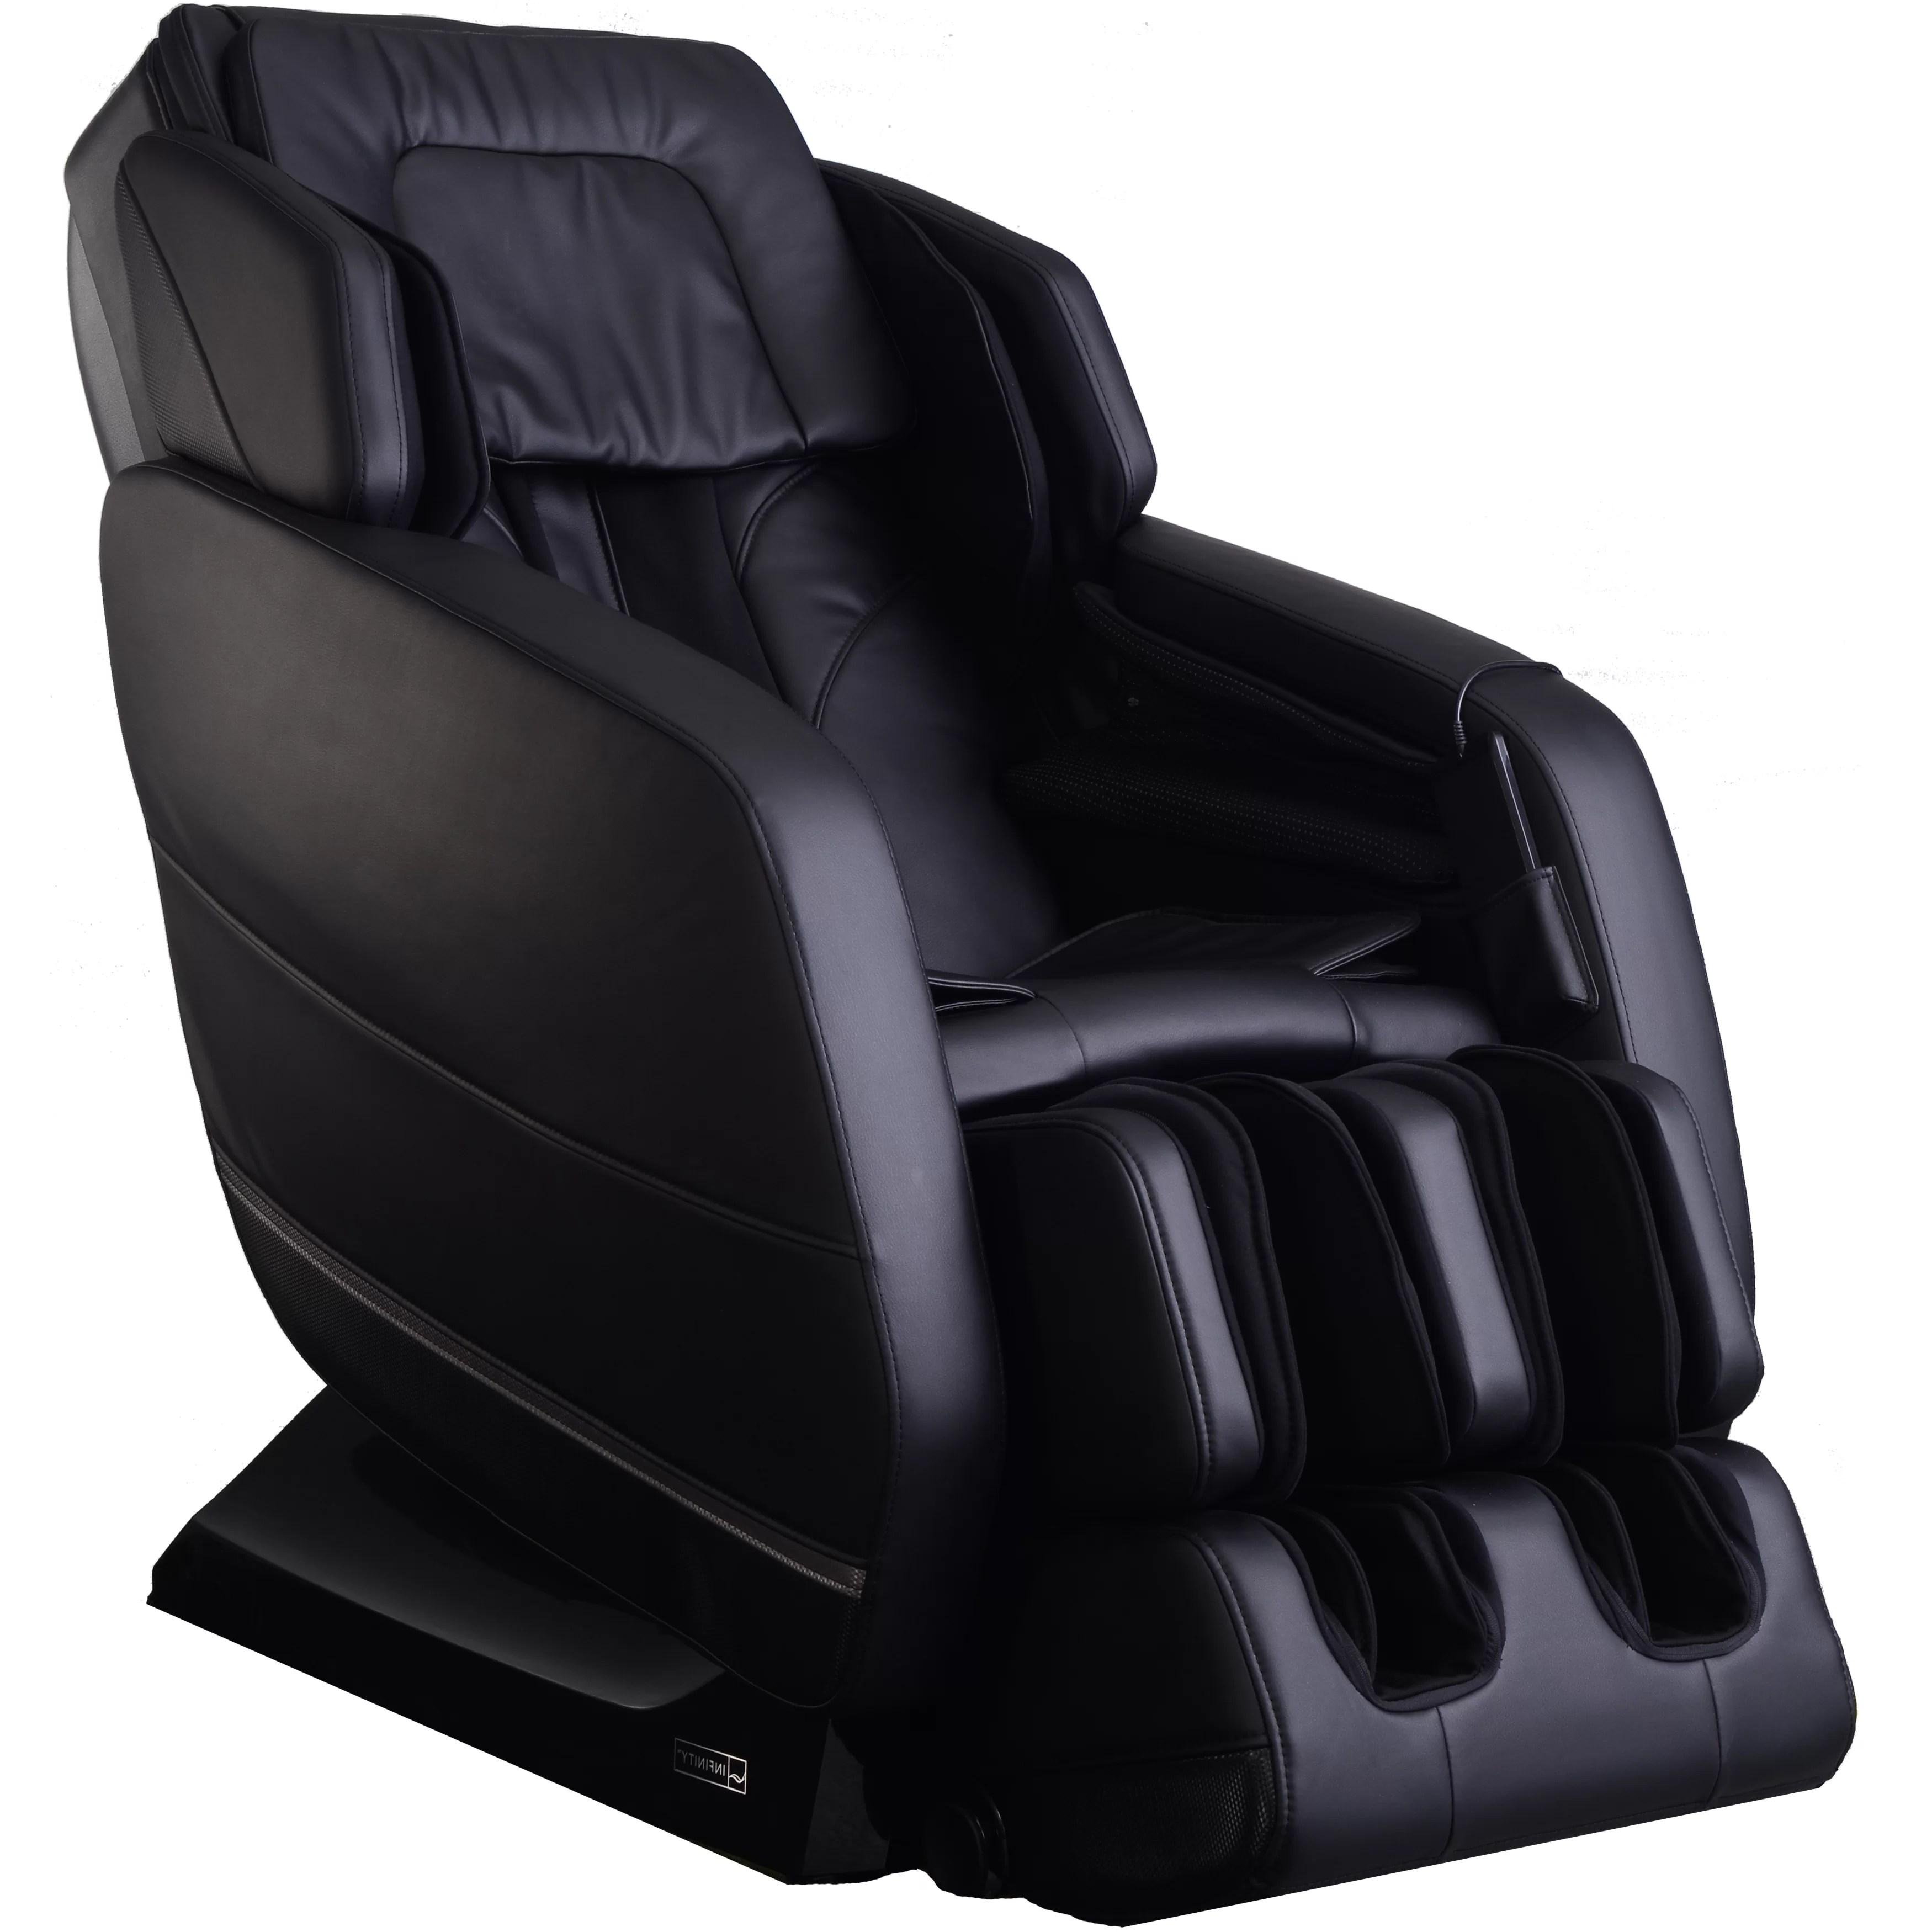 infinity massage chair foldable and table set evoke zero gravity wayfair